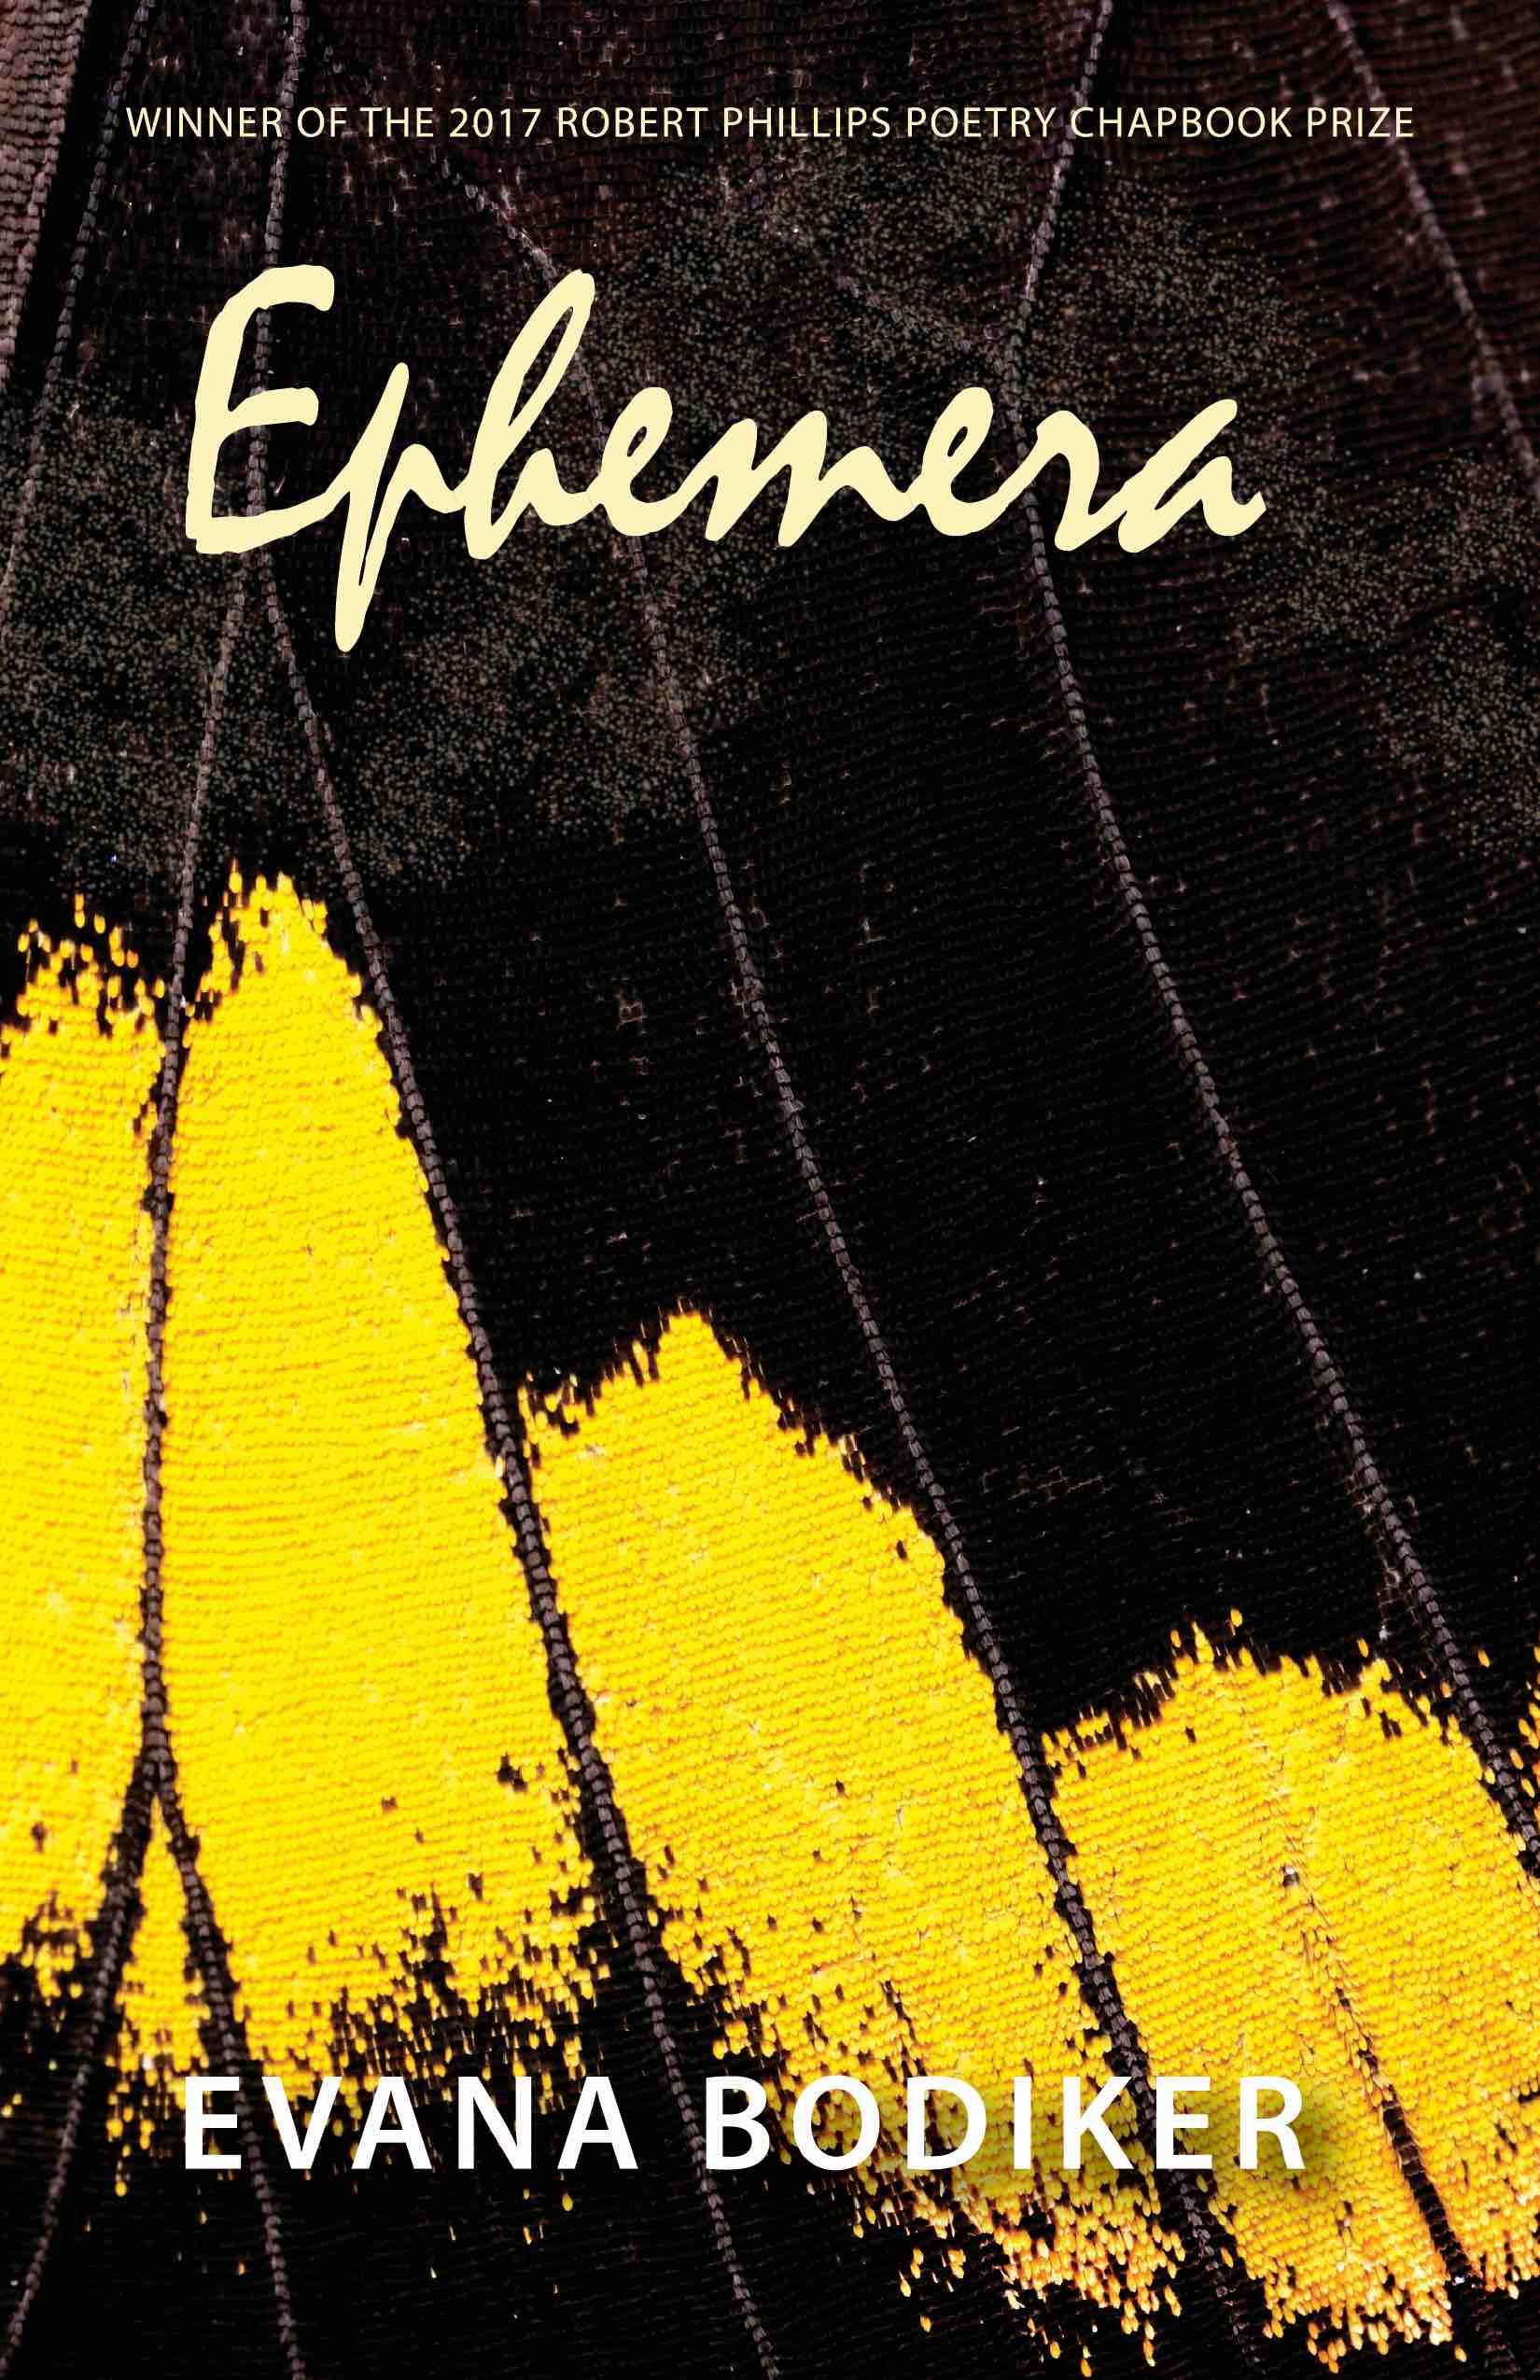 Cover of Evana Bodiker's chapbook Ephemera.